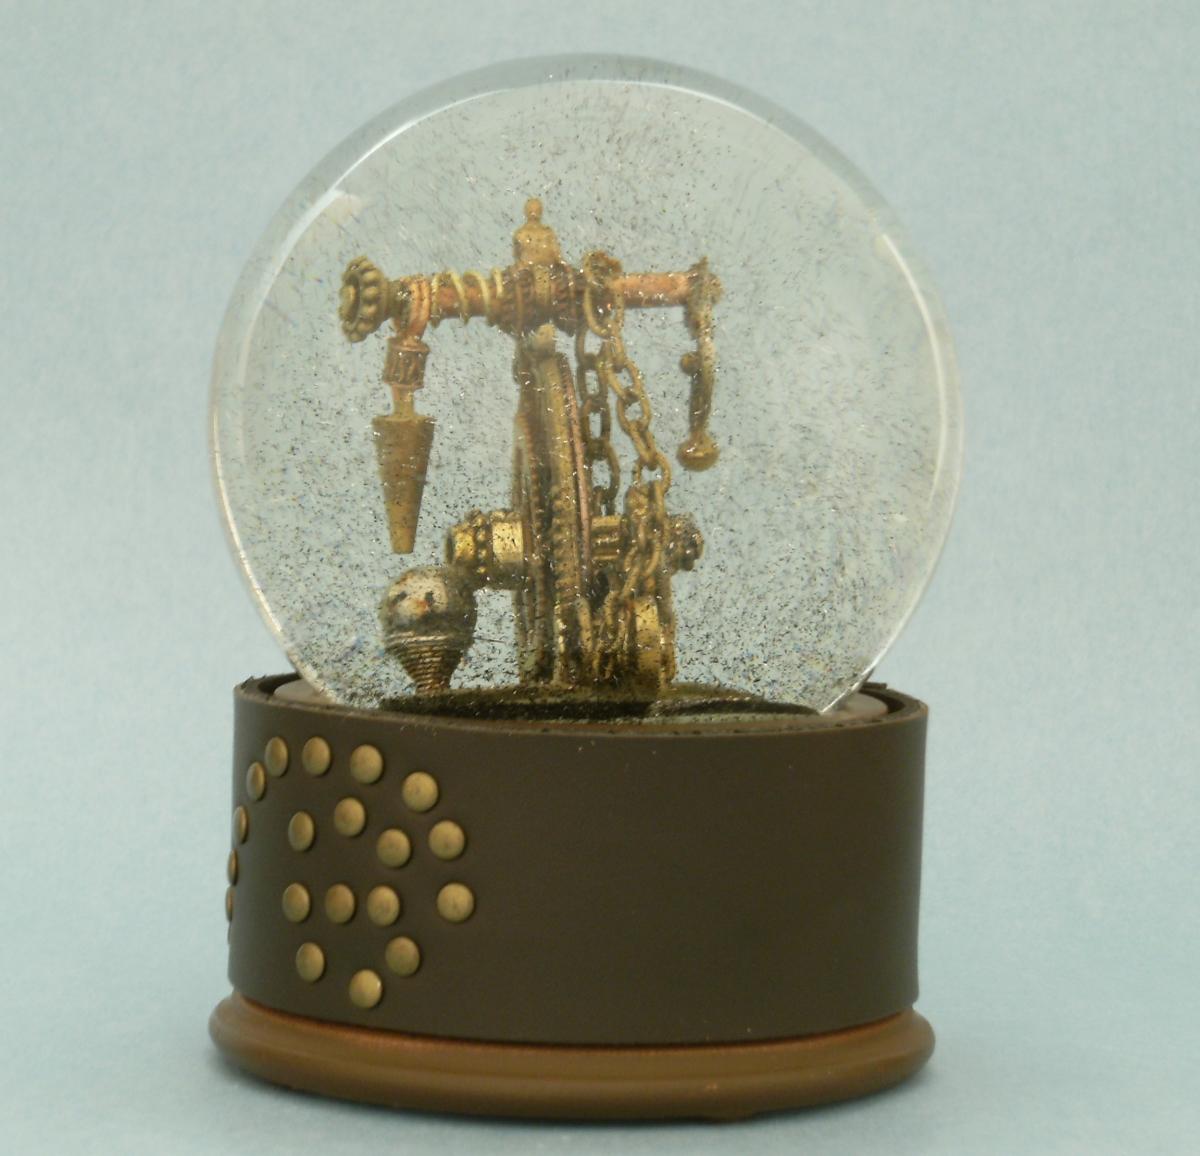 Steampunk My Ride penny farthing snow globe by Camryn Forrest Designs 2013